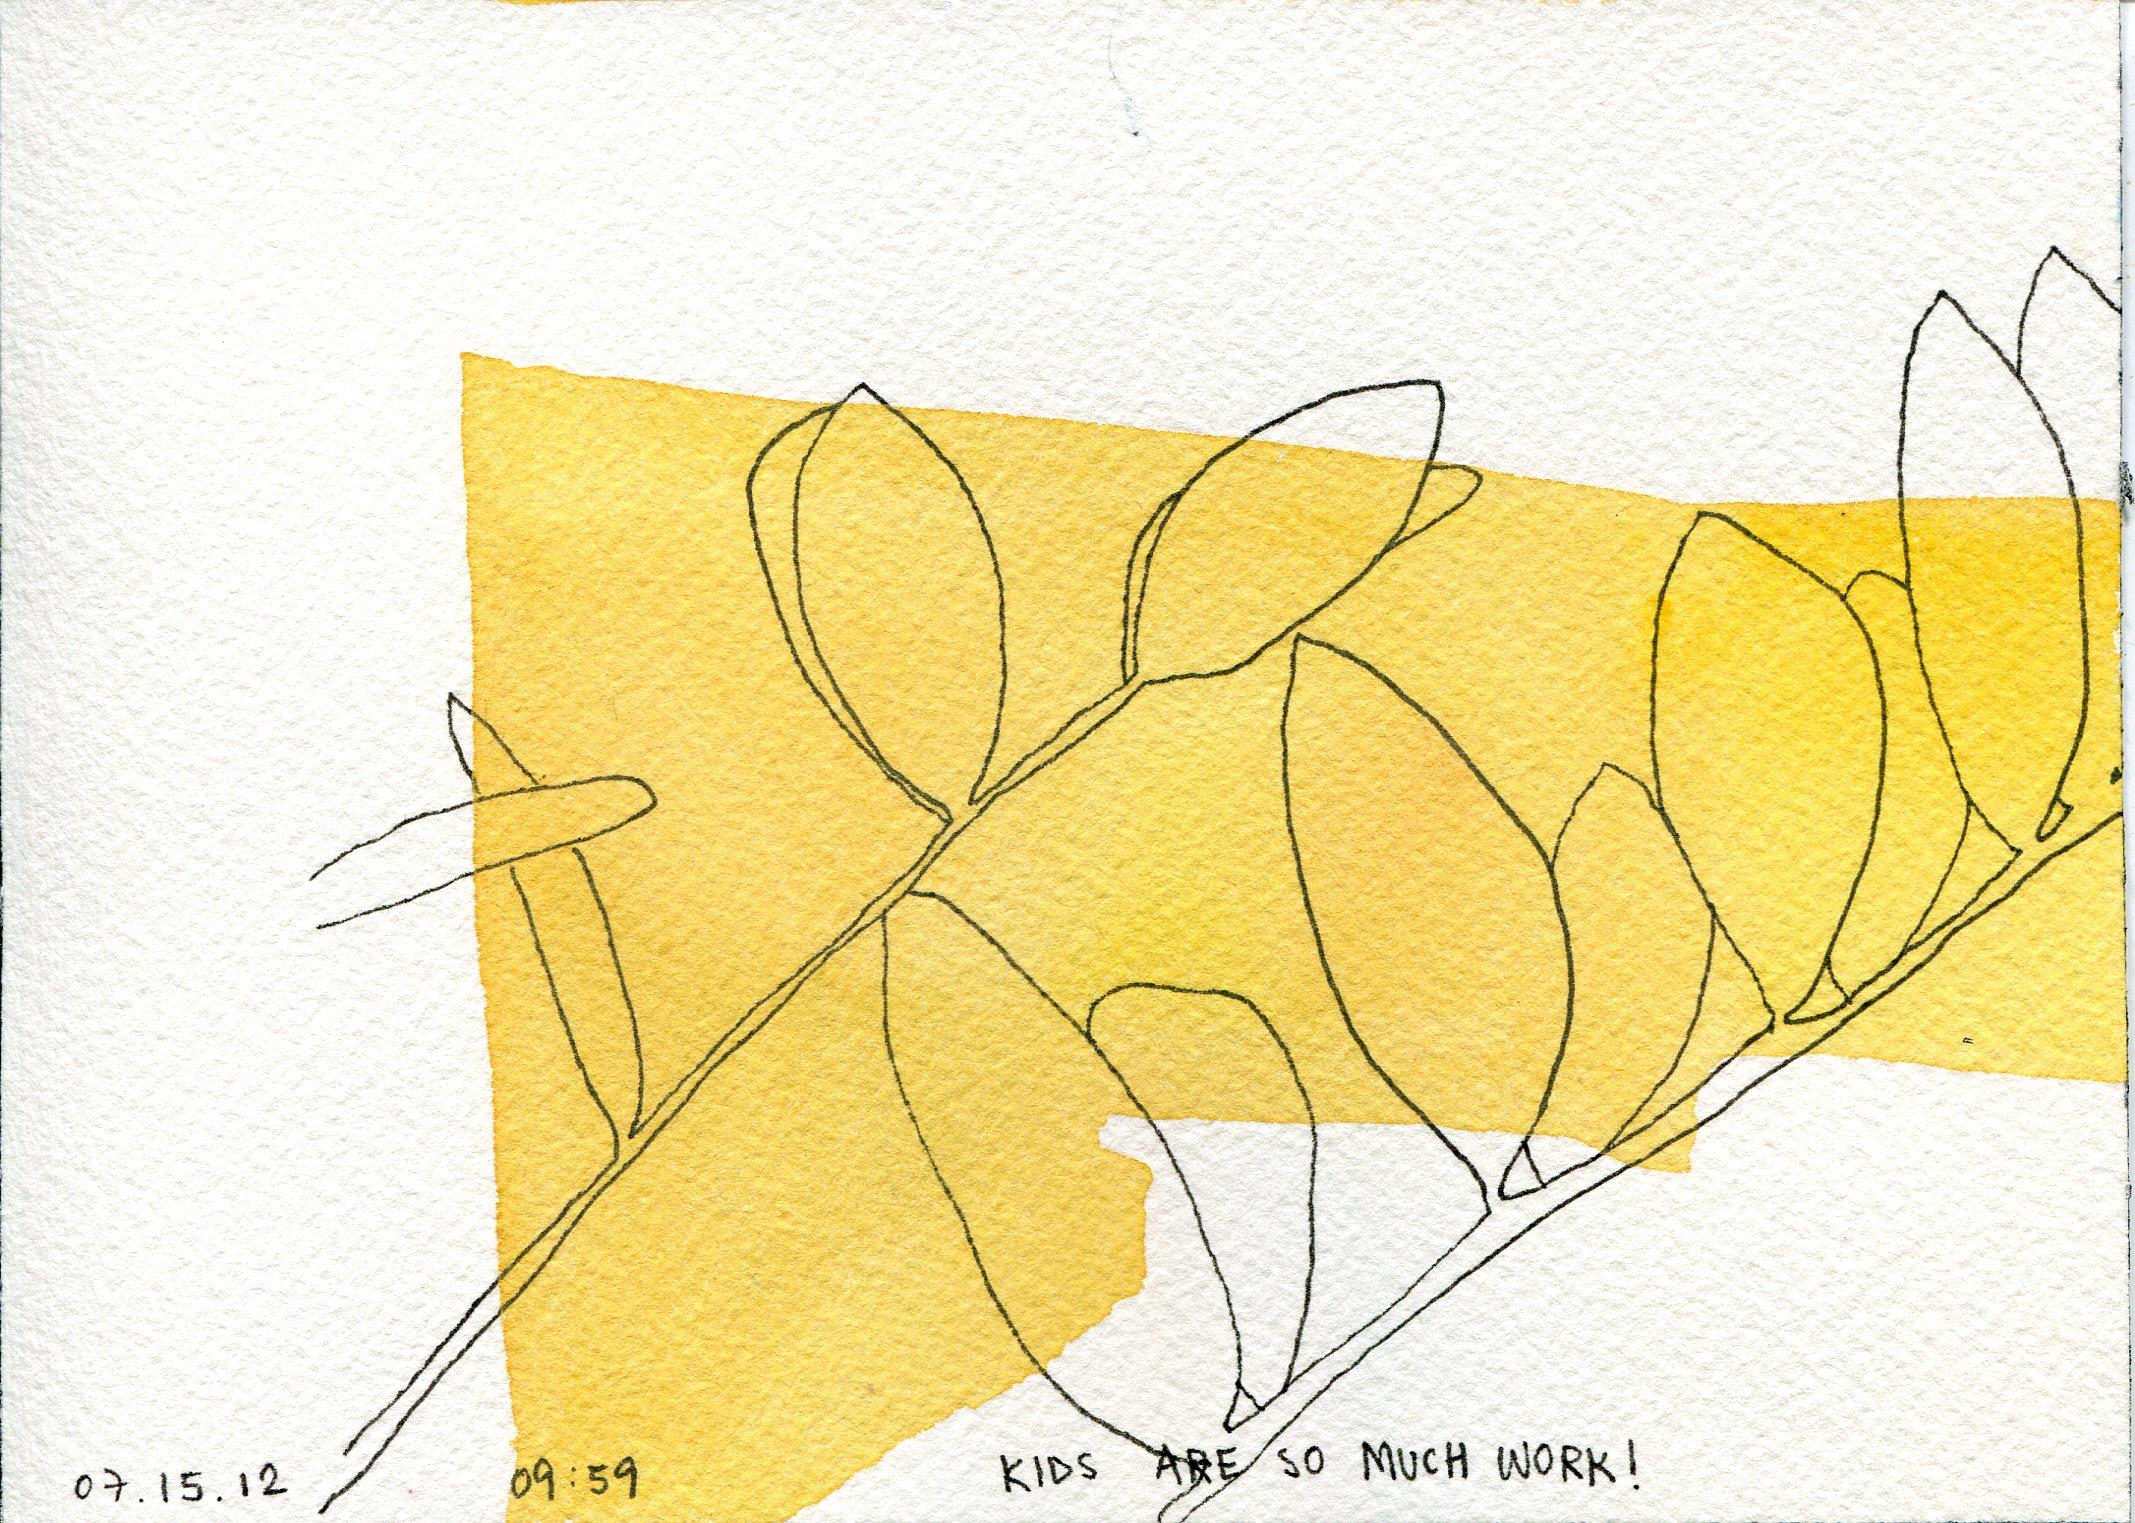 2012-07-21 drawing001.jpg